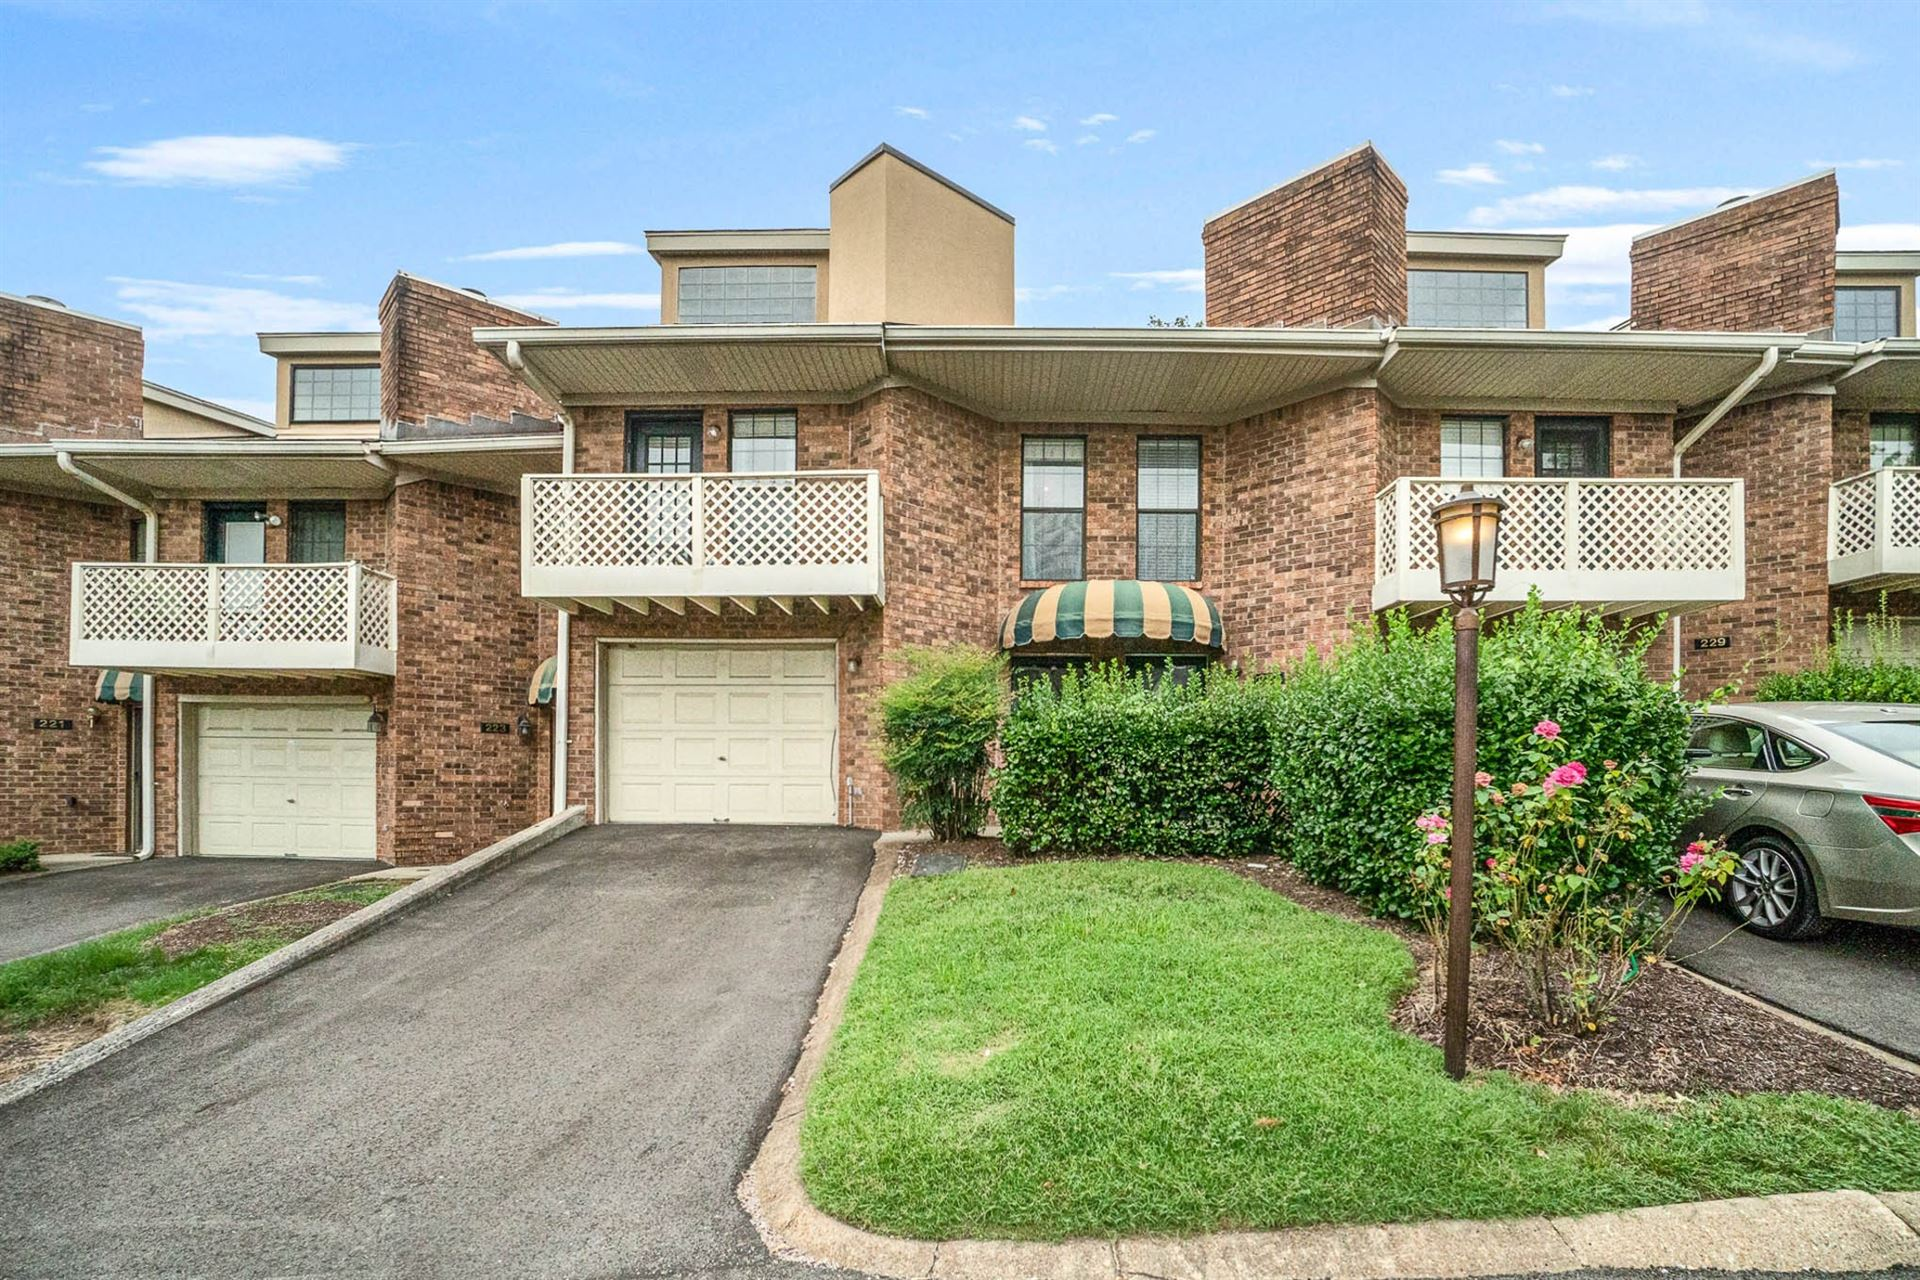 225 Glenstone Cir, Brentwood, TN 37027 - MLS#: 2235494